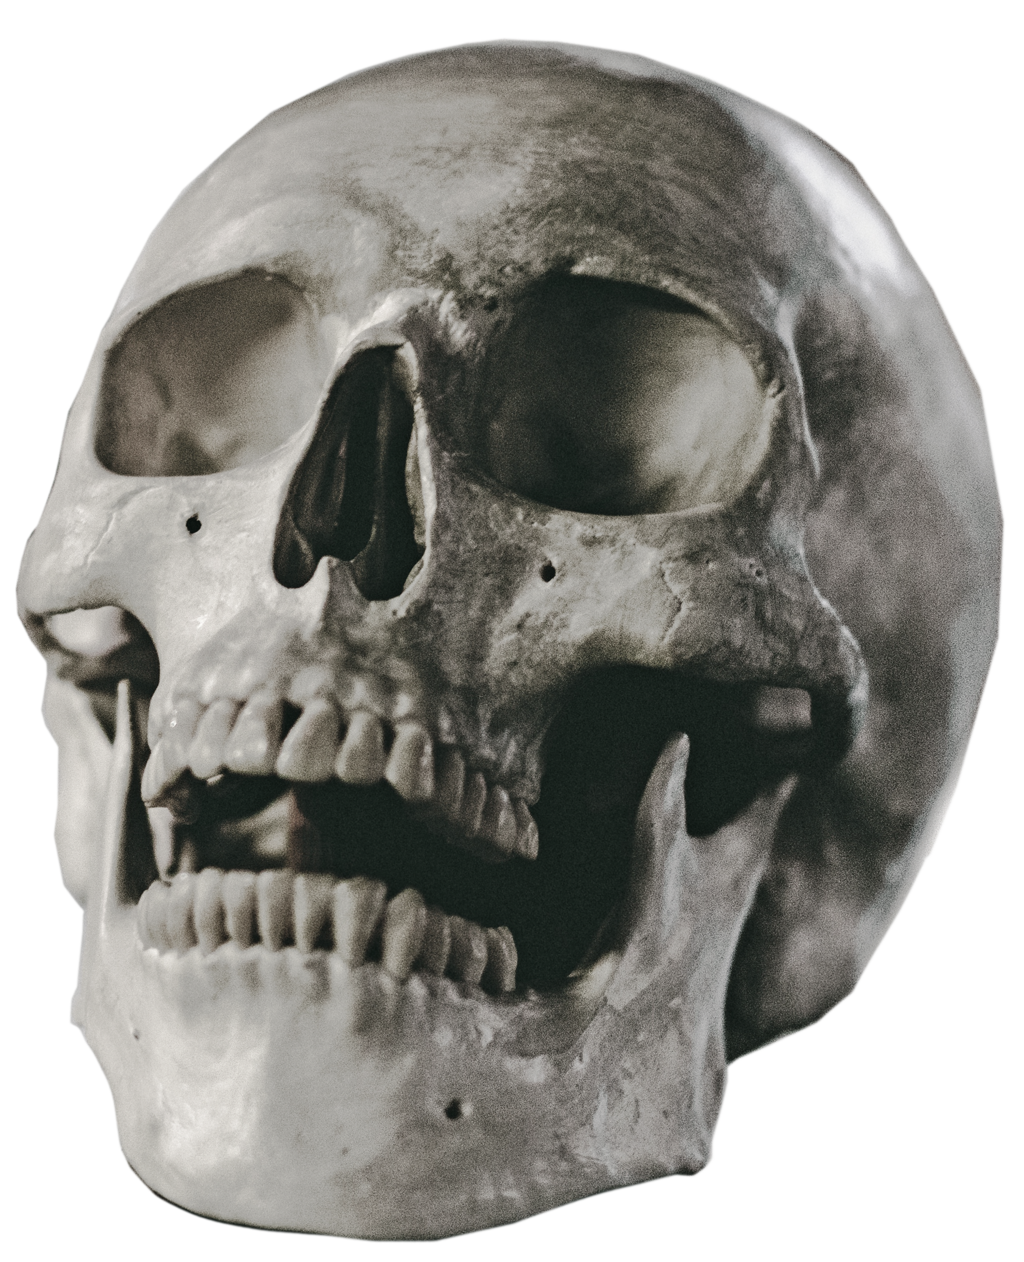 Halloween Skull PNG Background Image.